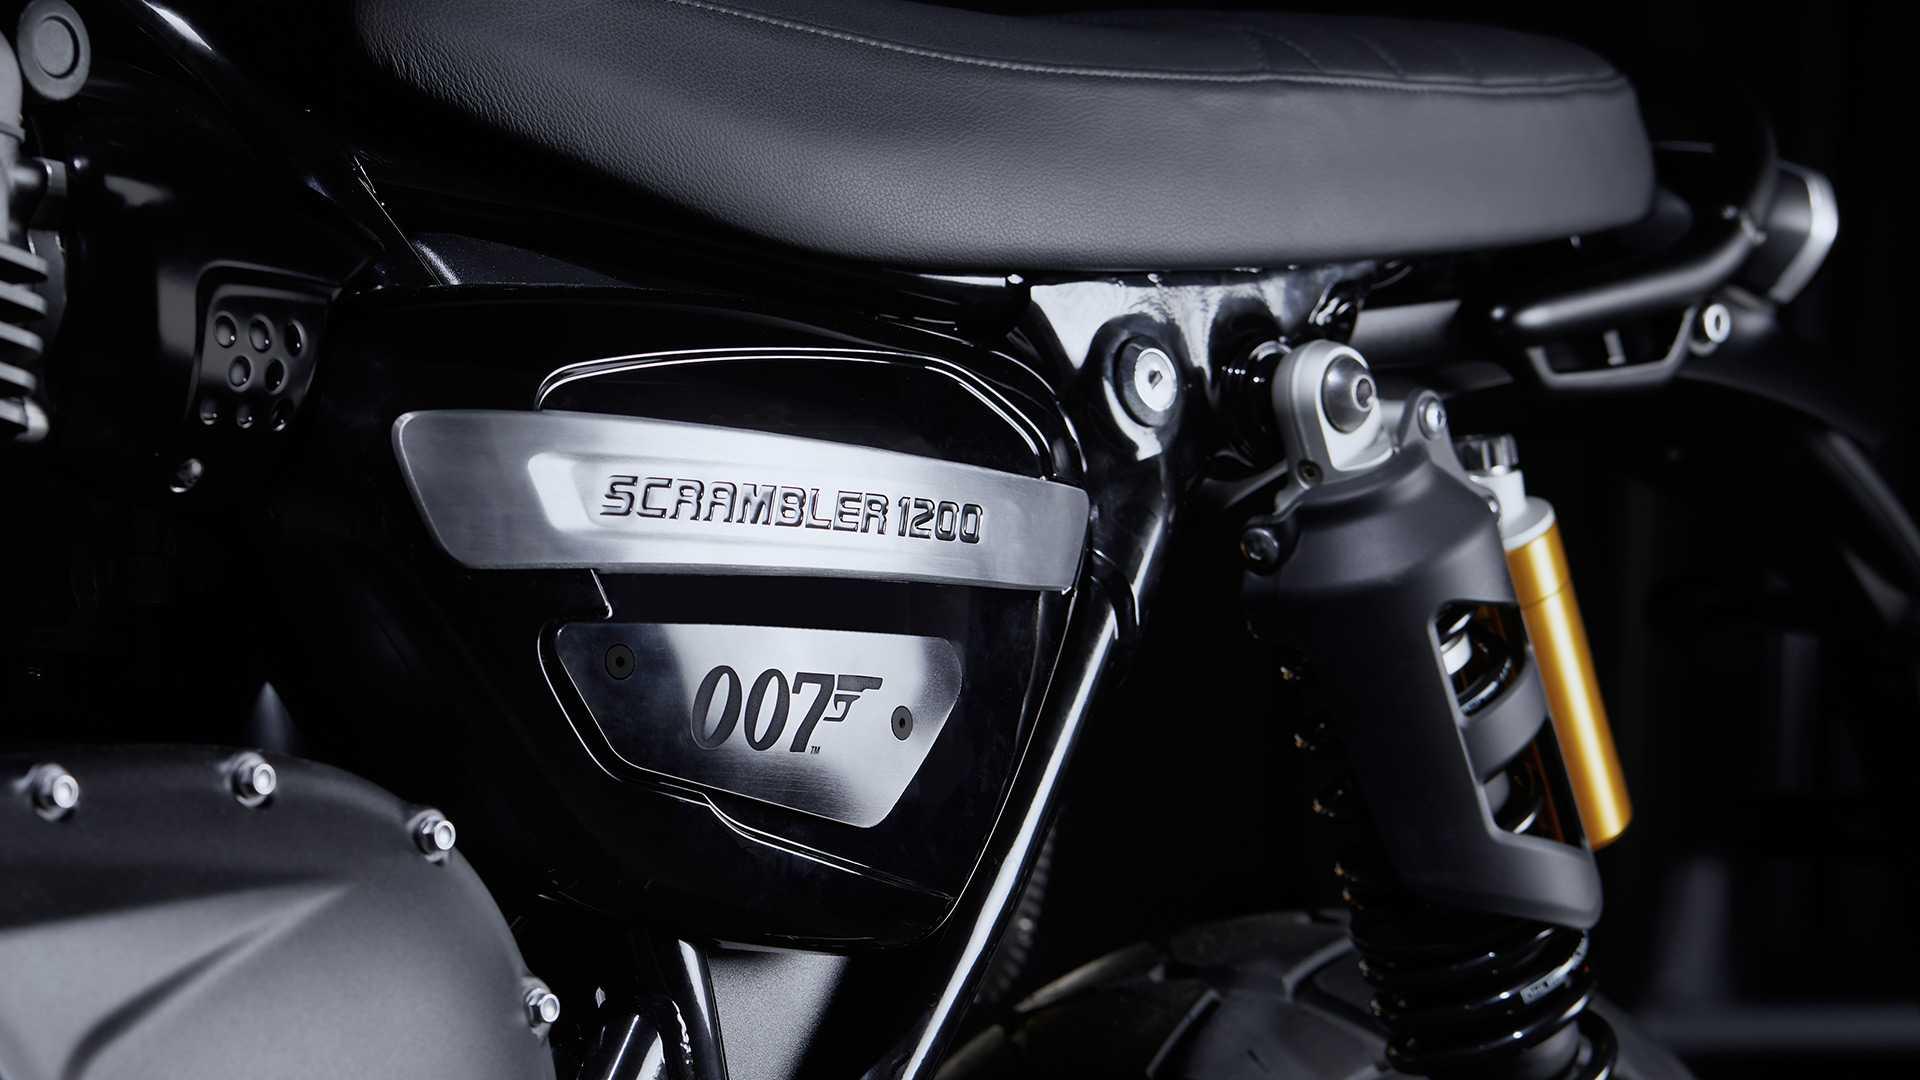 2020 Triumph Scrambler 1200 Bond Edition Side Panels